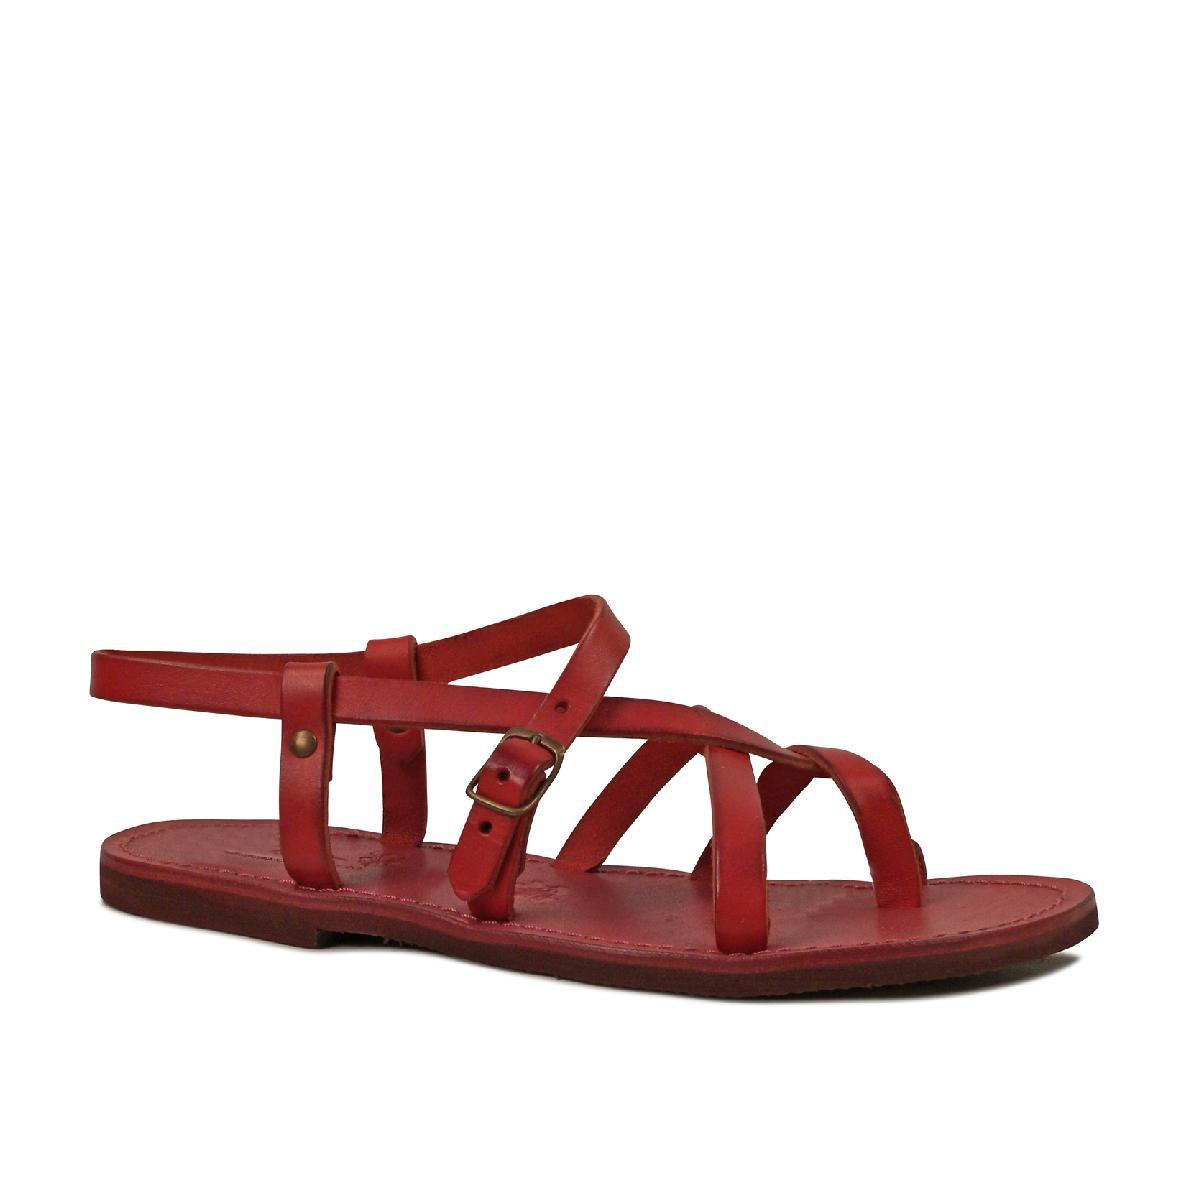 womens rote flache gladiator sandalen handgefertigt in italien. Black Bedroom Furniture Sets. Home Design Ideas